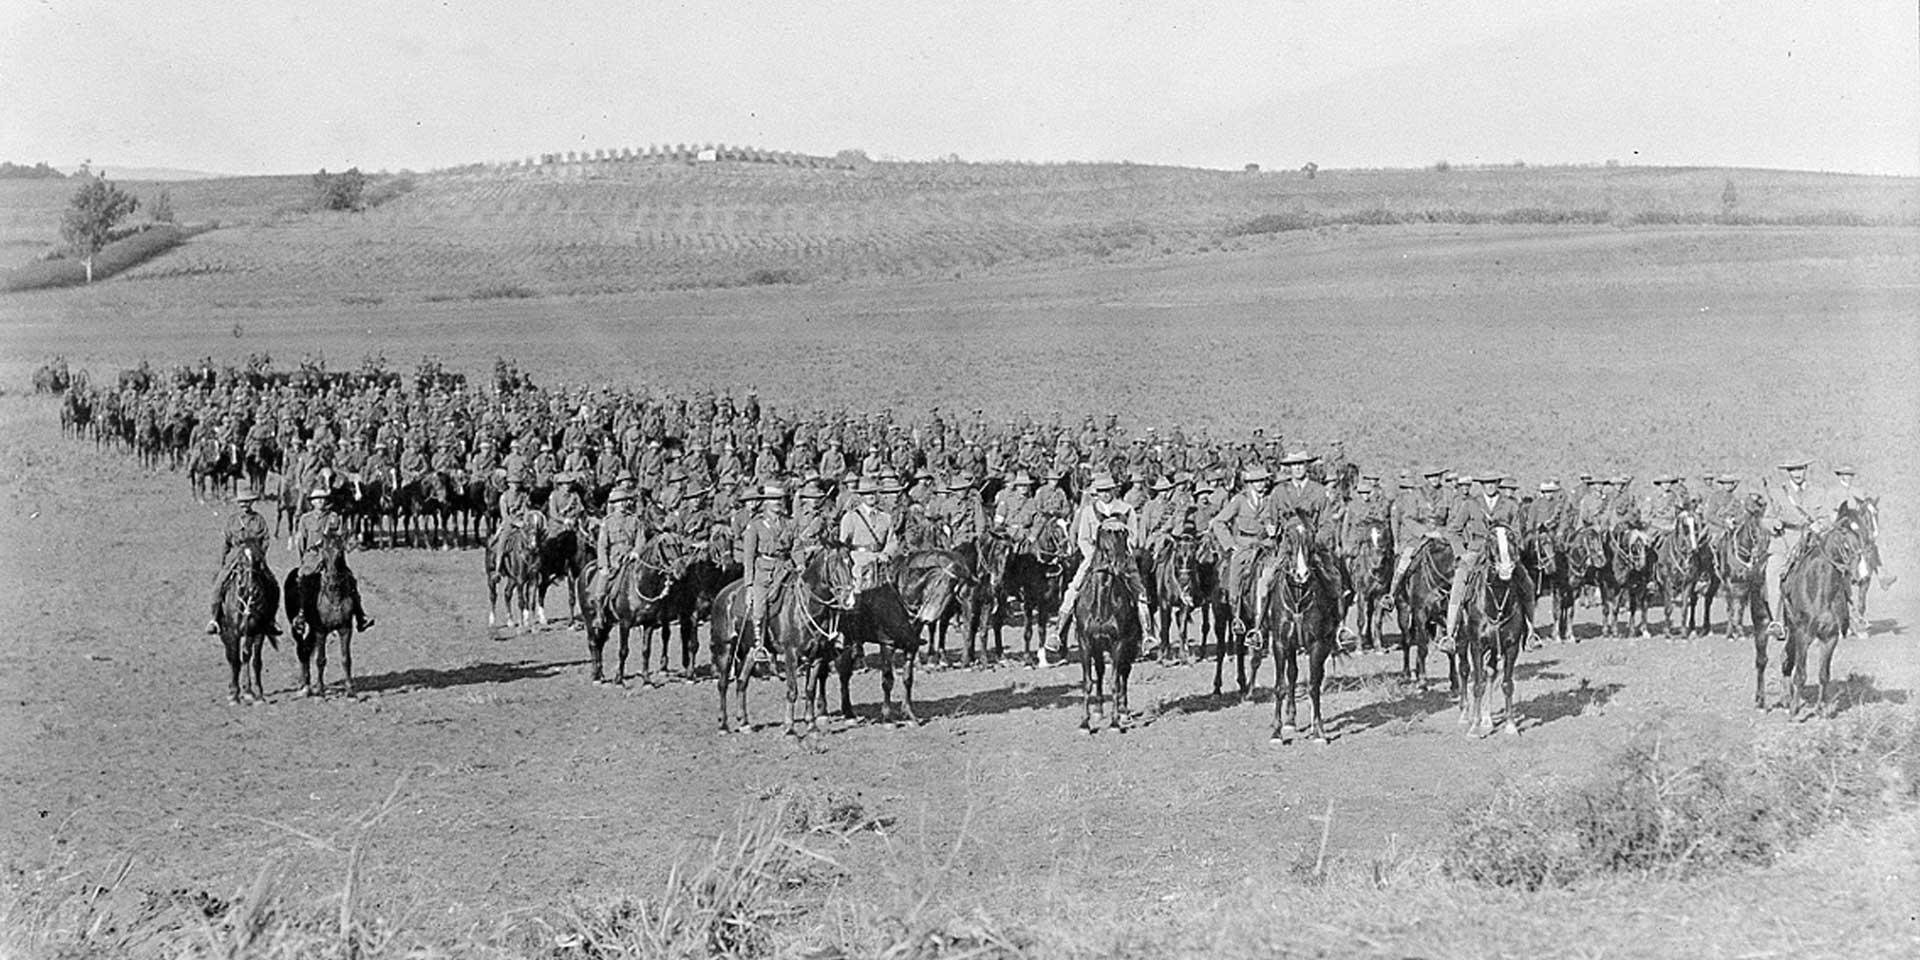 Australian Light Horse in Palestine, 1918